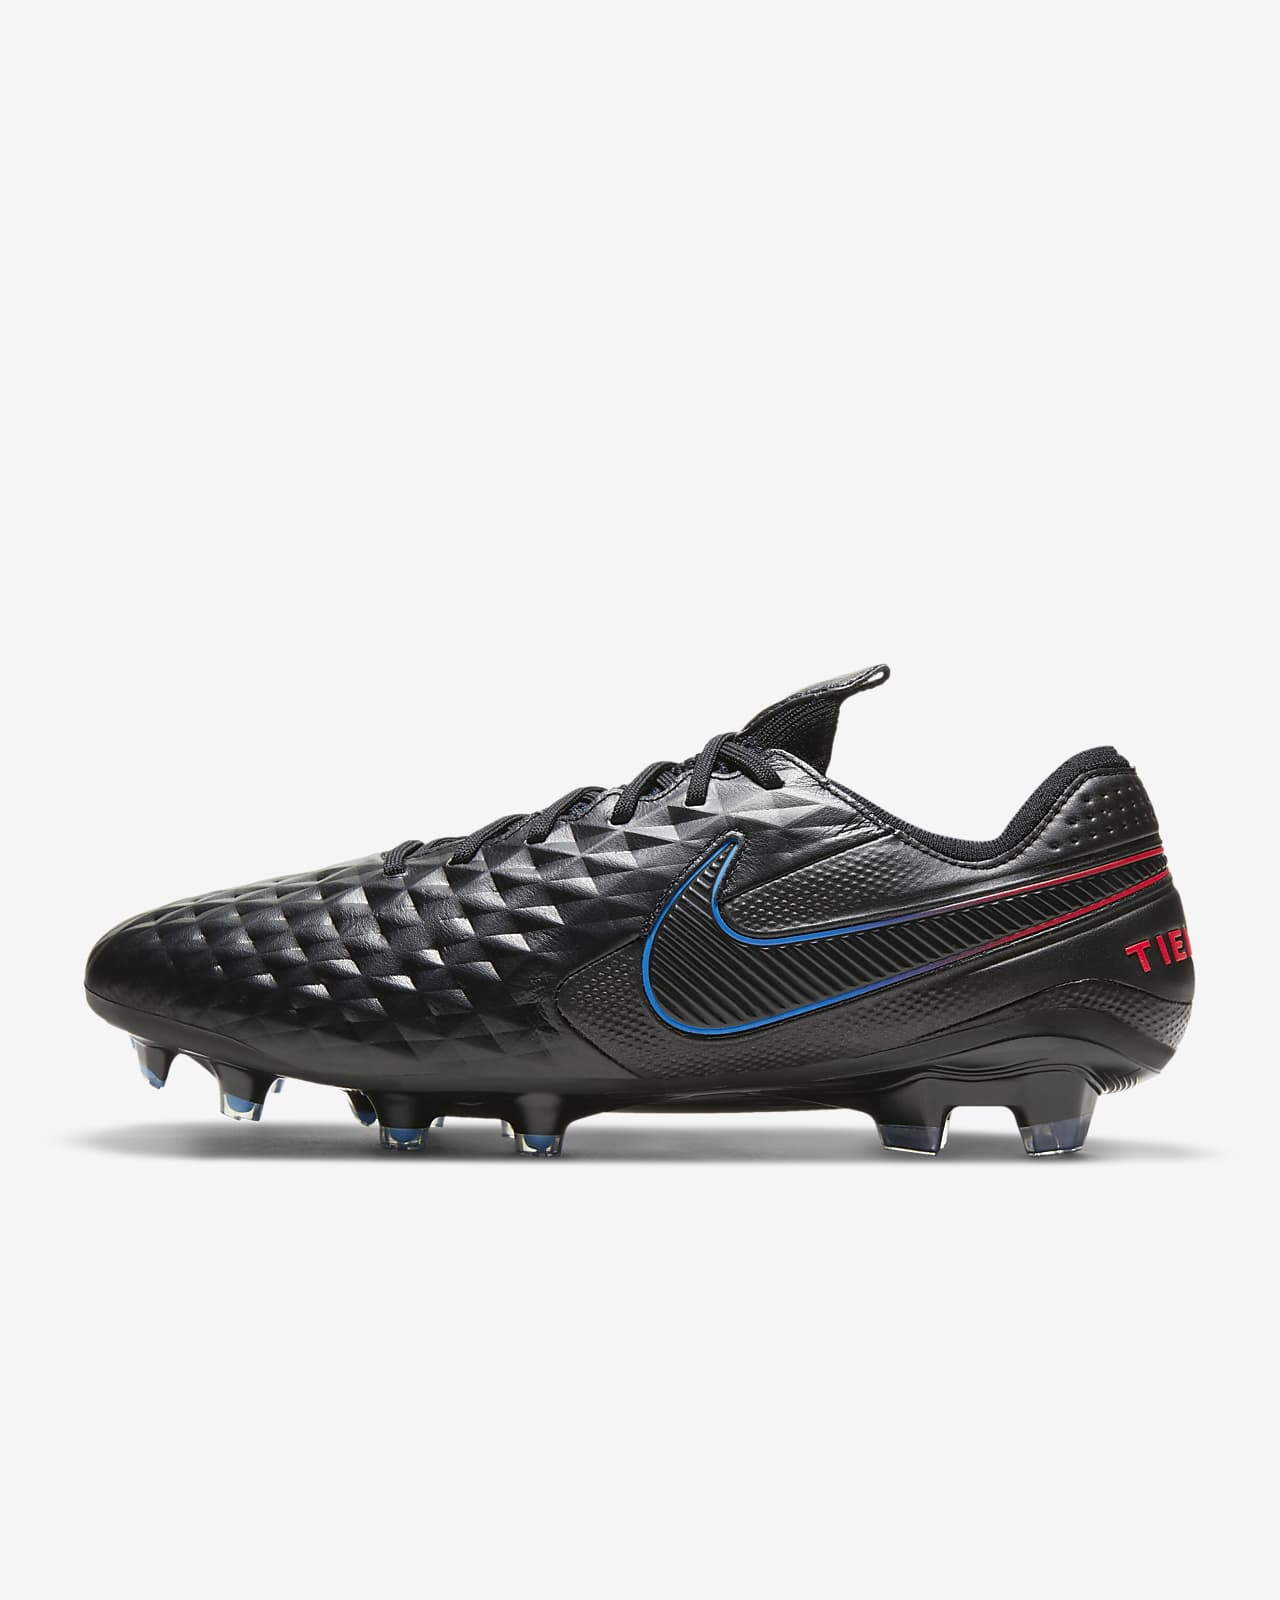 Nike Tiempo Legend 8 Elite FG Firm-Ground Soccer Cleats